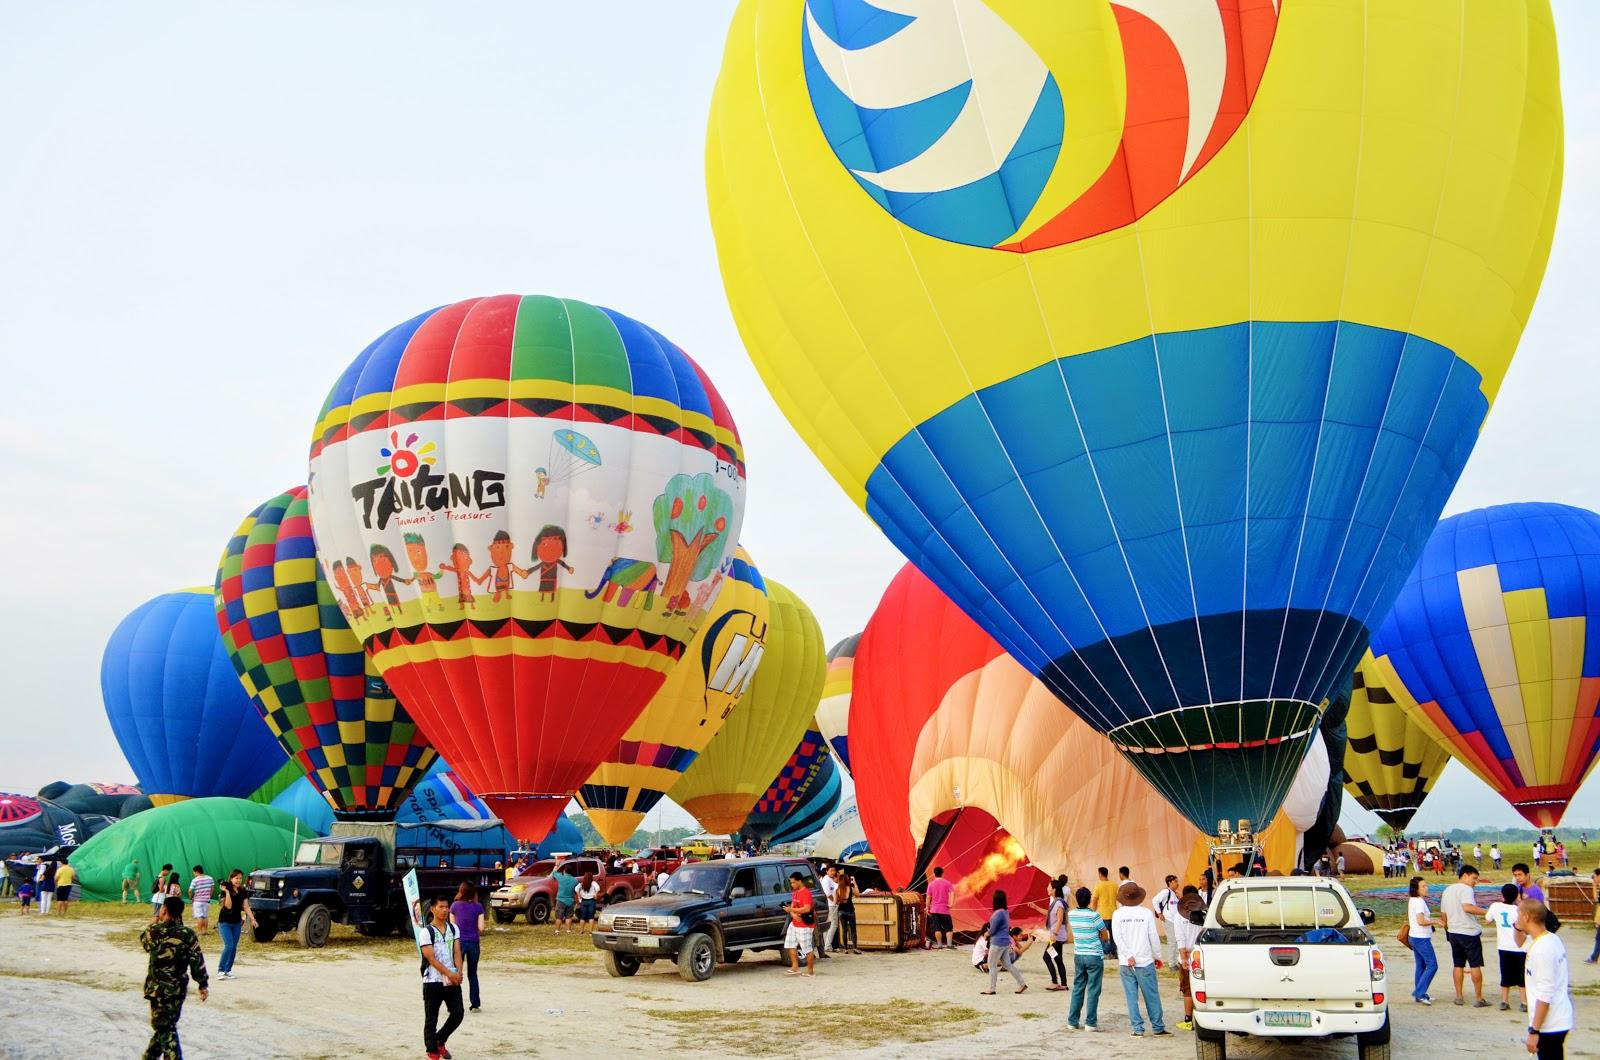 Hot Air Balloon (Clark Festival)